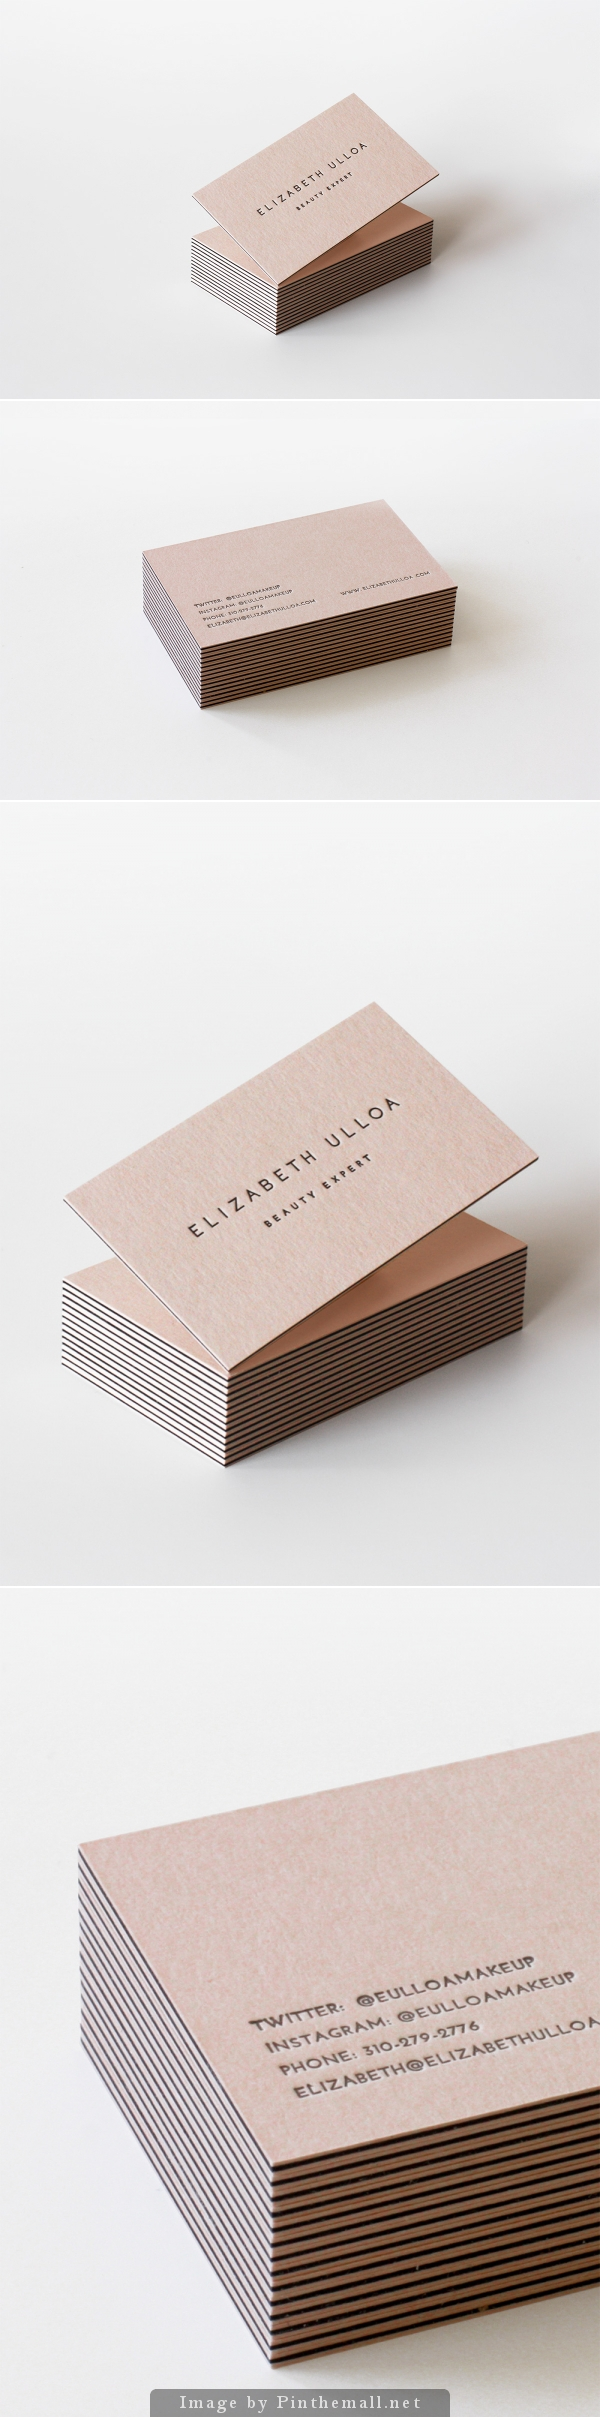 Business Cards For Elizabeth Ulloa By Julia Kostreva Creative Studio